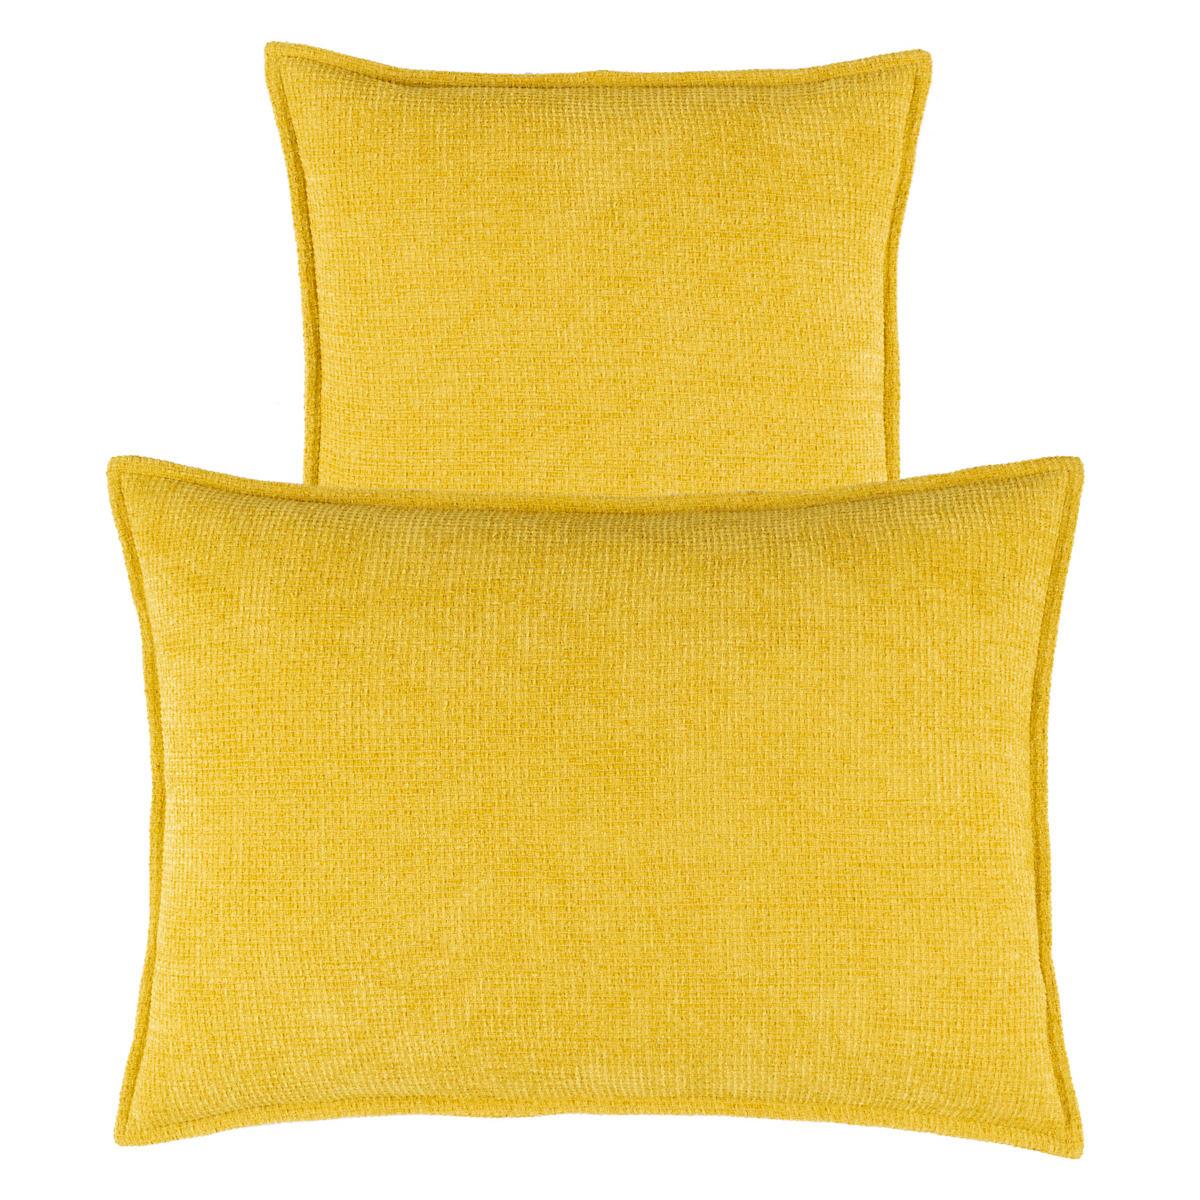 Bauble Chenille Gold Decorative Pillow